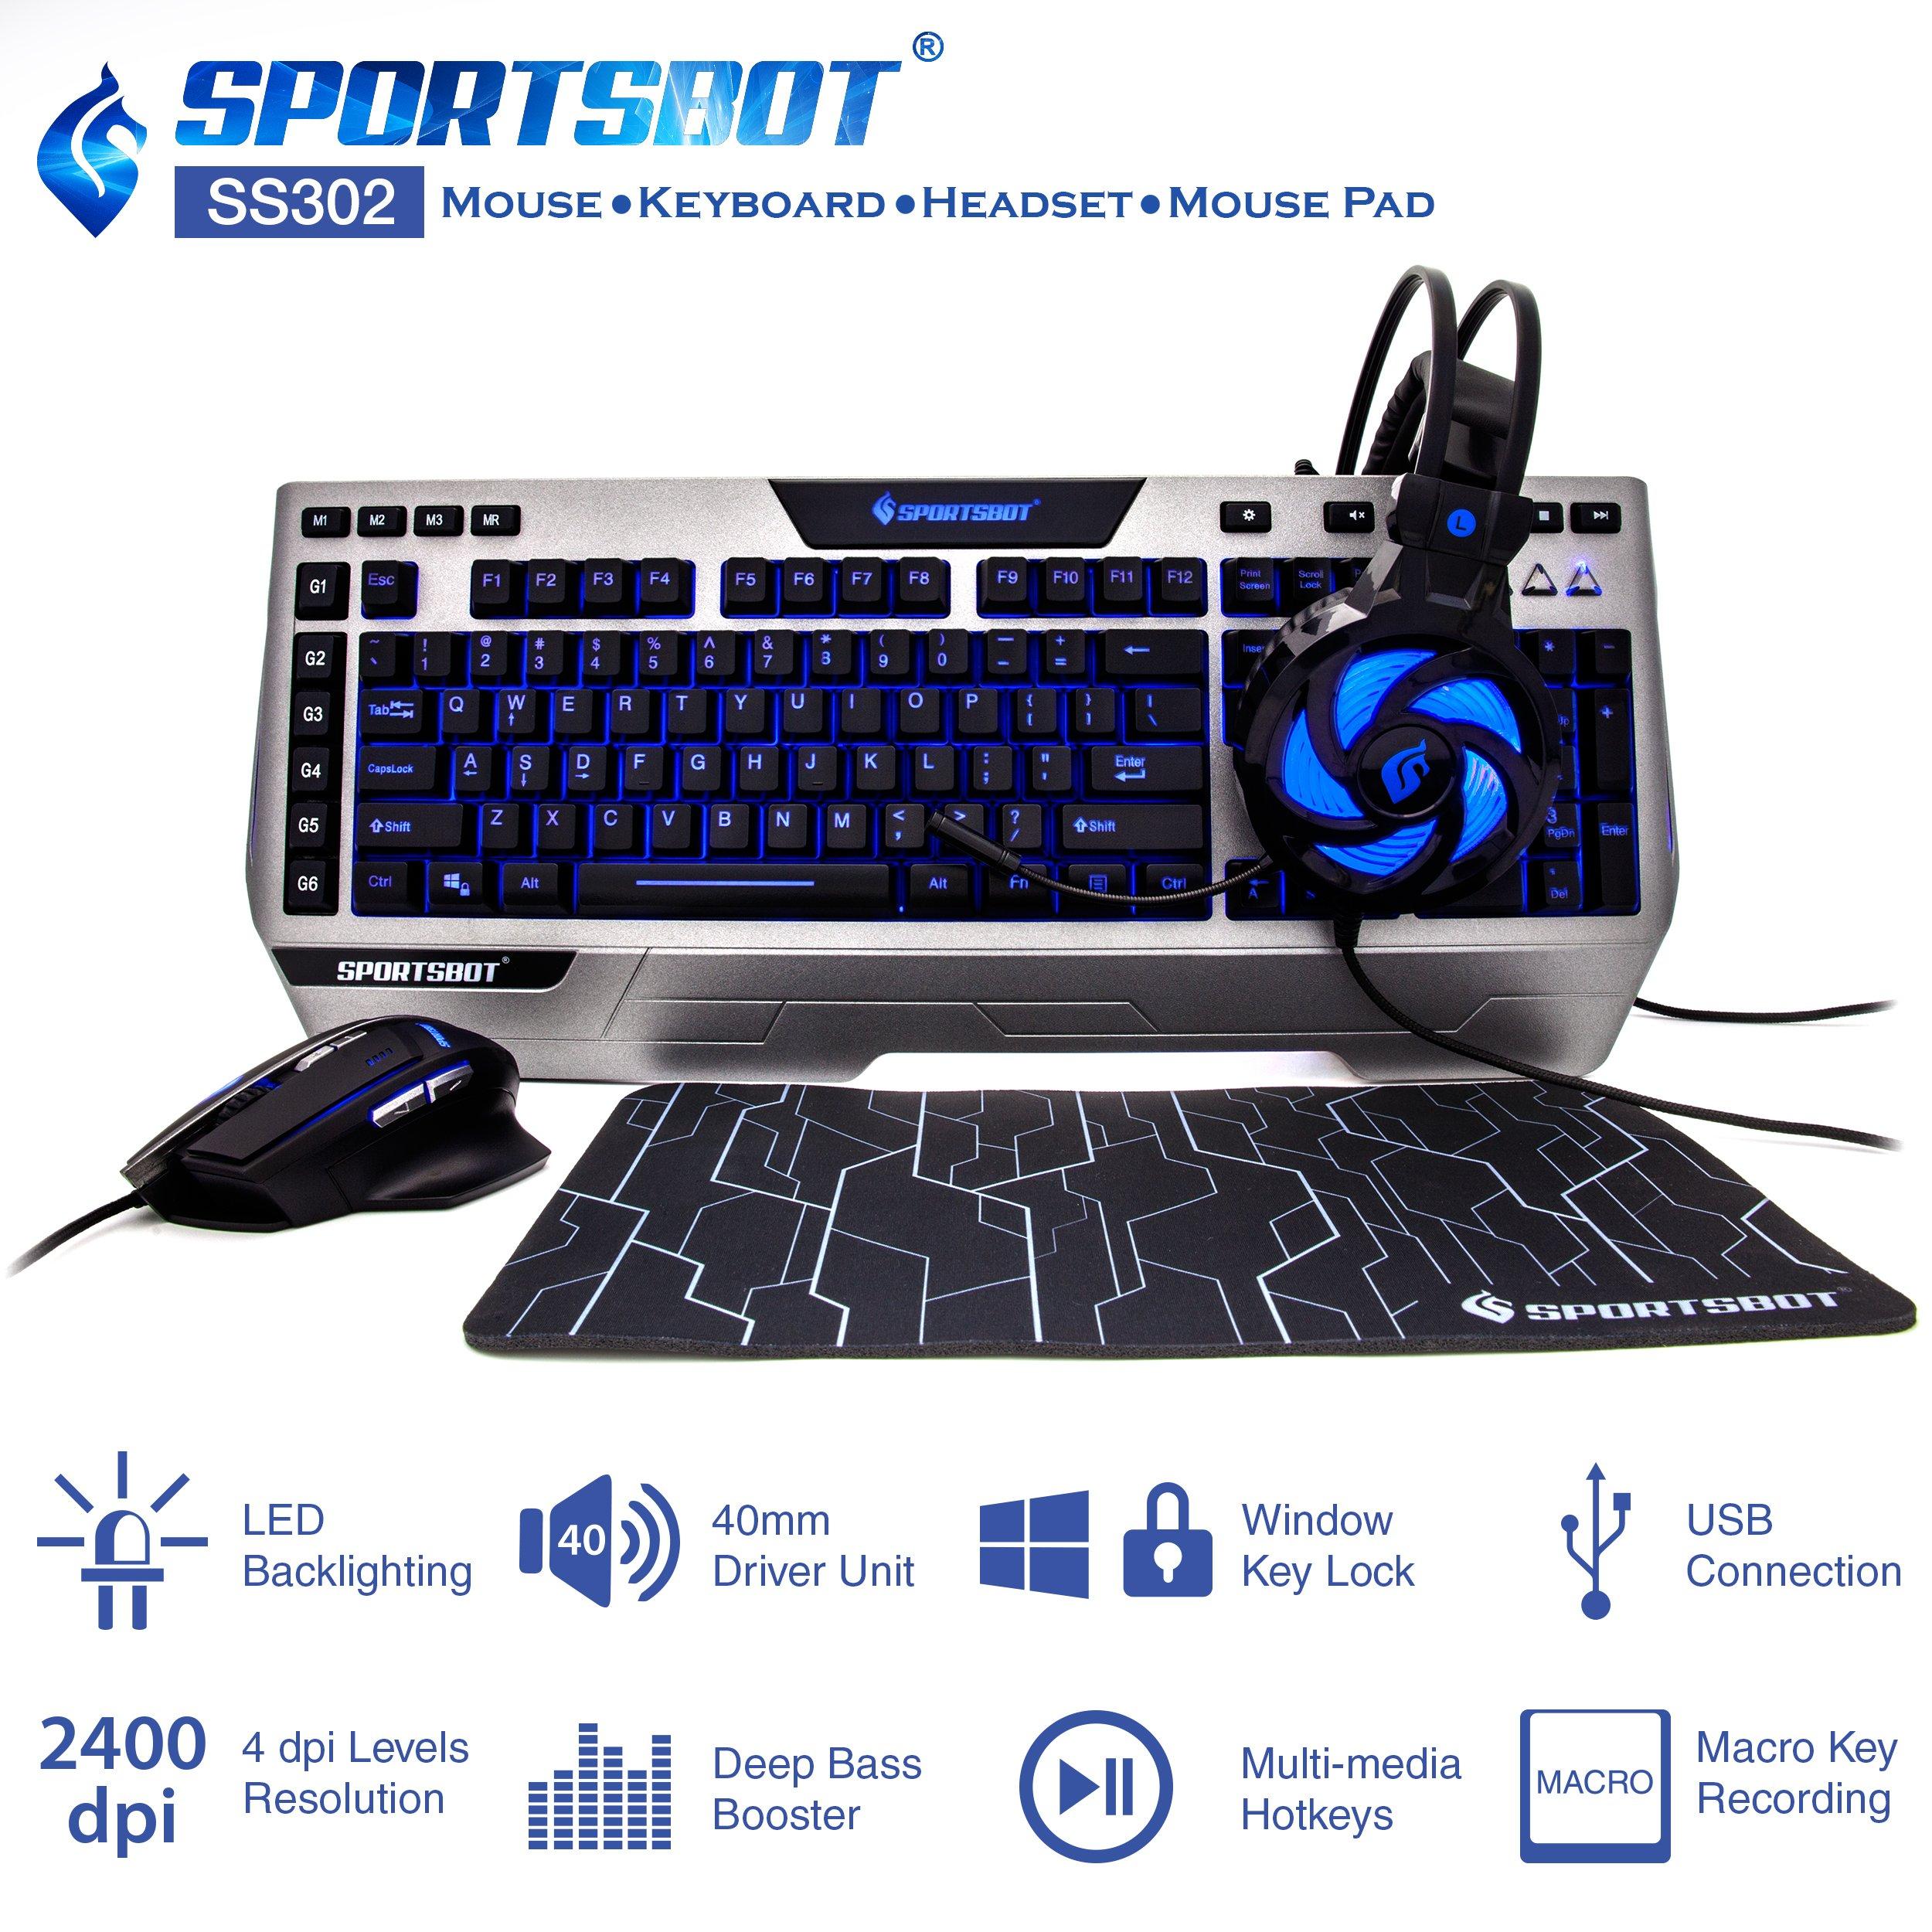 SportsBot SS302 4-in-1 LED Gaming Over-Ear Headset Headphone, Keyboard, Mouse & MousePad Combo Set w/ 6 Programmable Macro Keys, 3 Macro Modes, 40mm Speaker Driver, Microphone by Soundbot